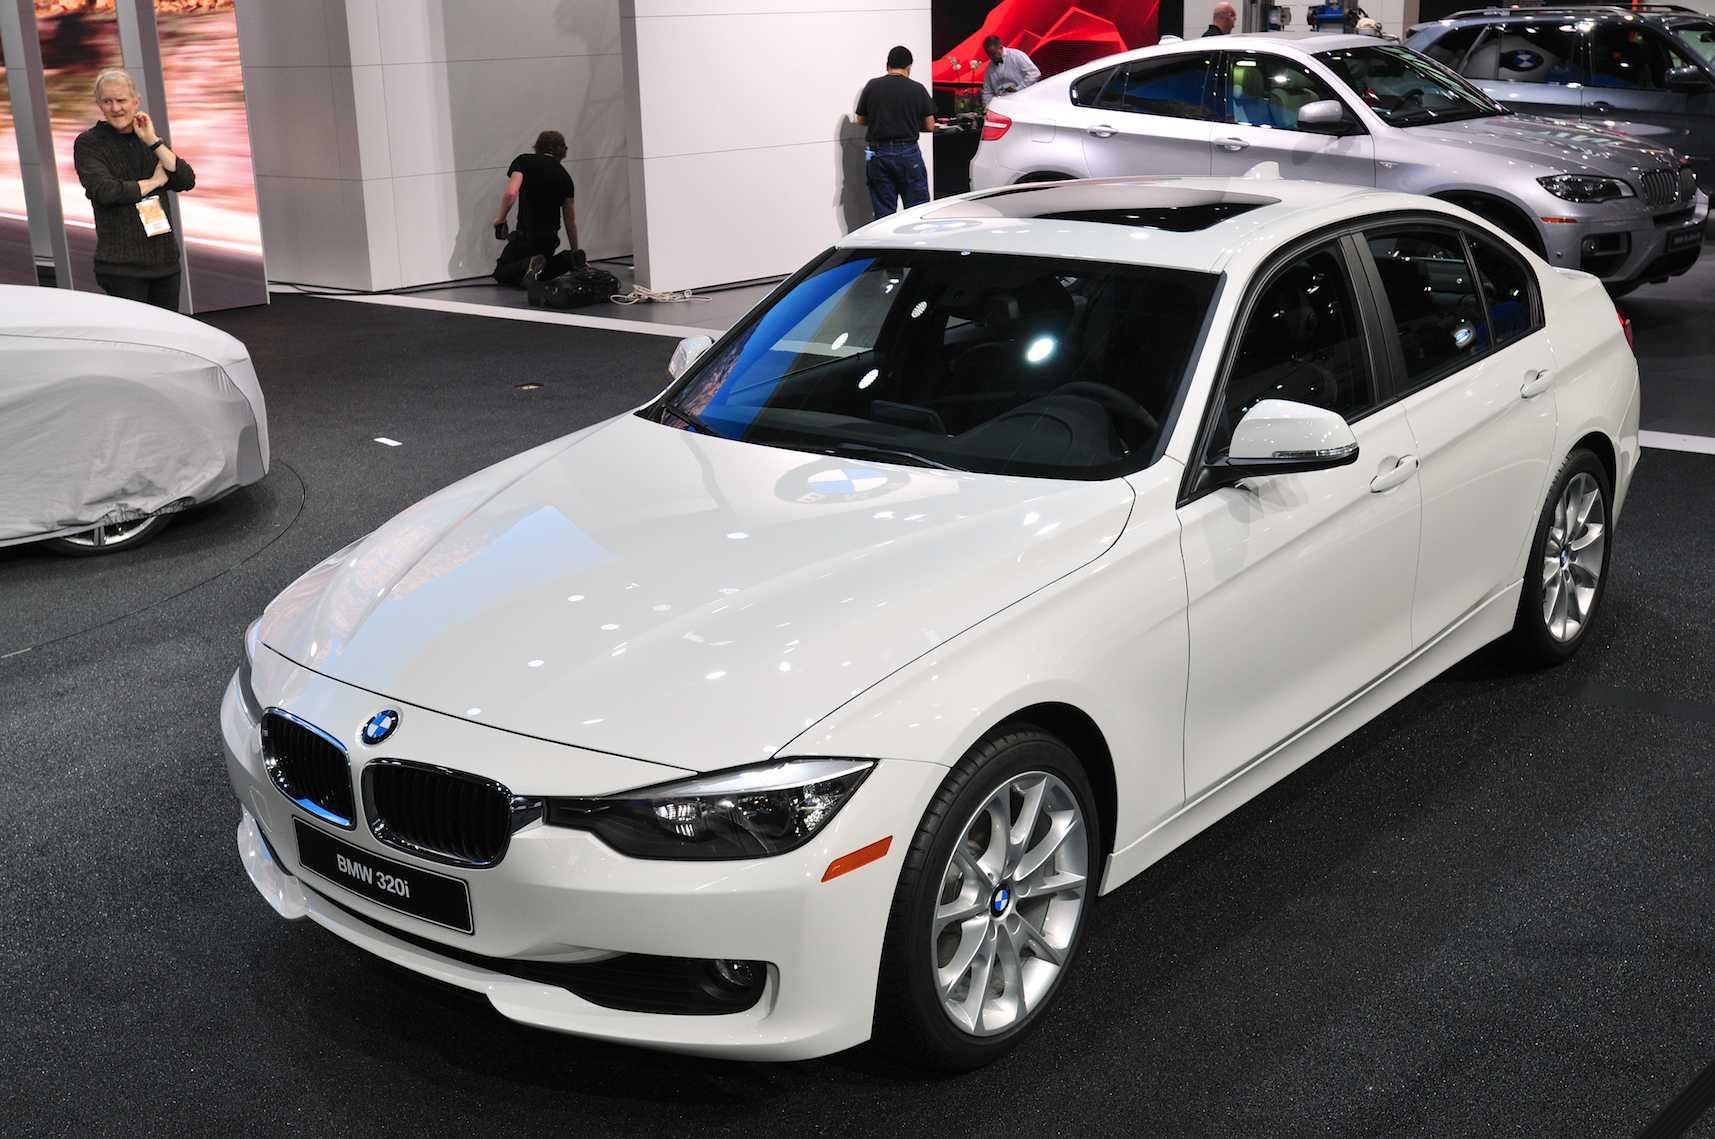 The New BMW 320i Sedan